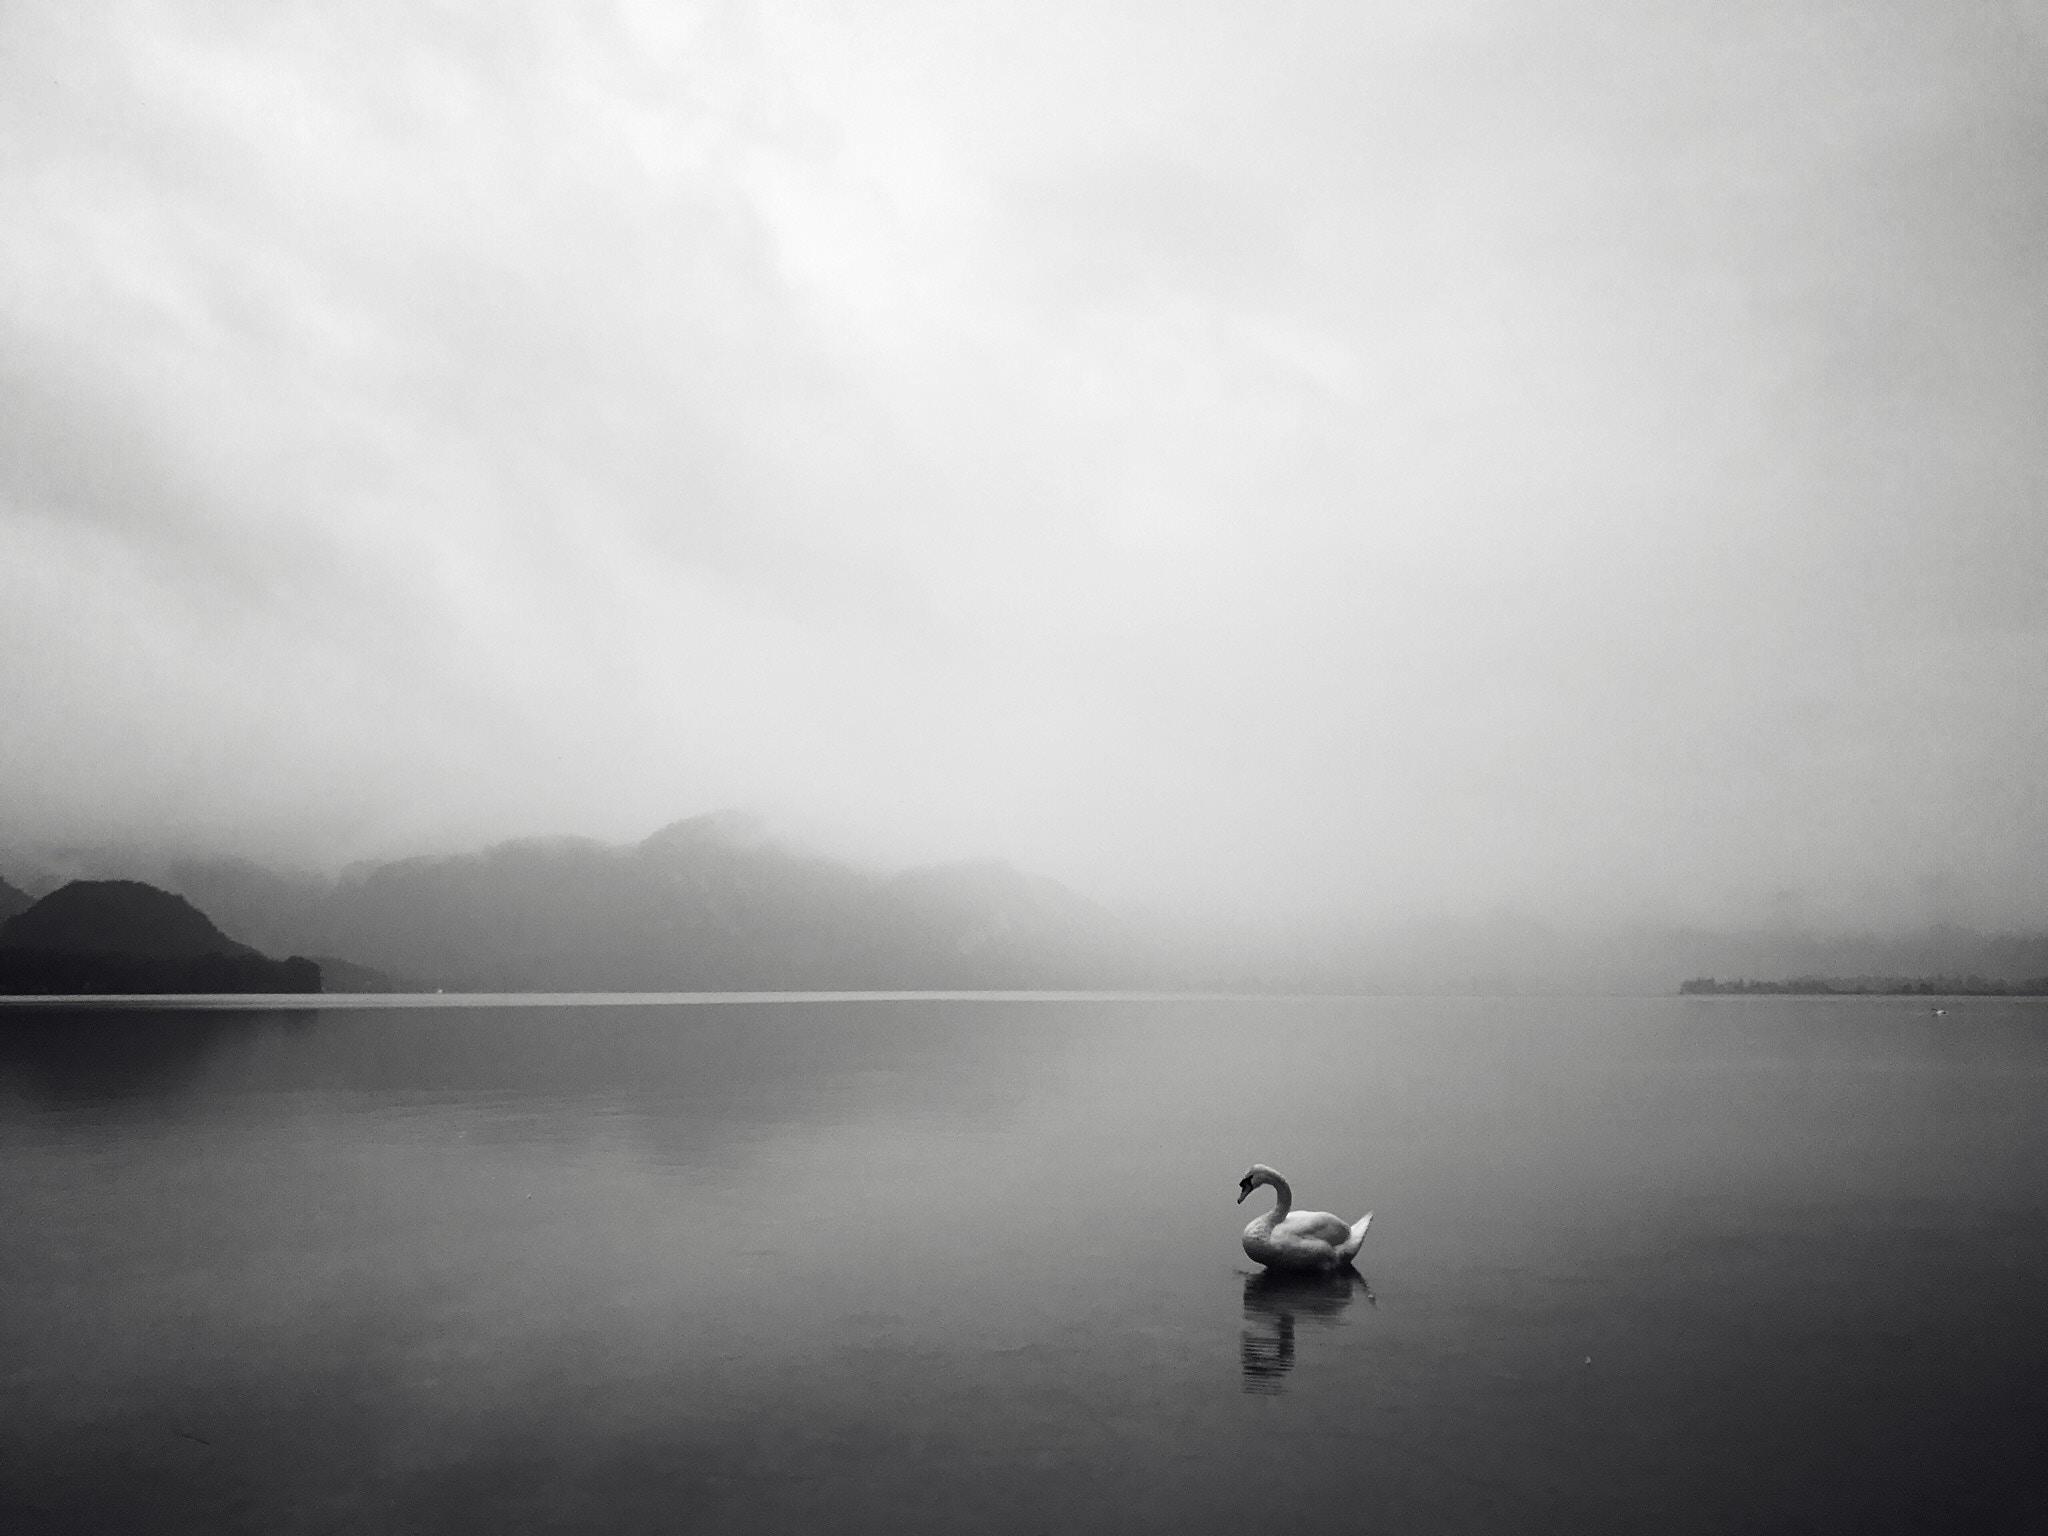 The gift of stillness